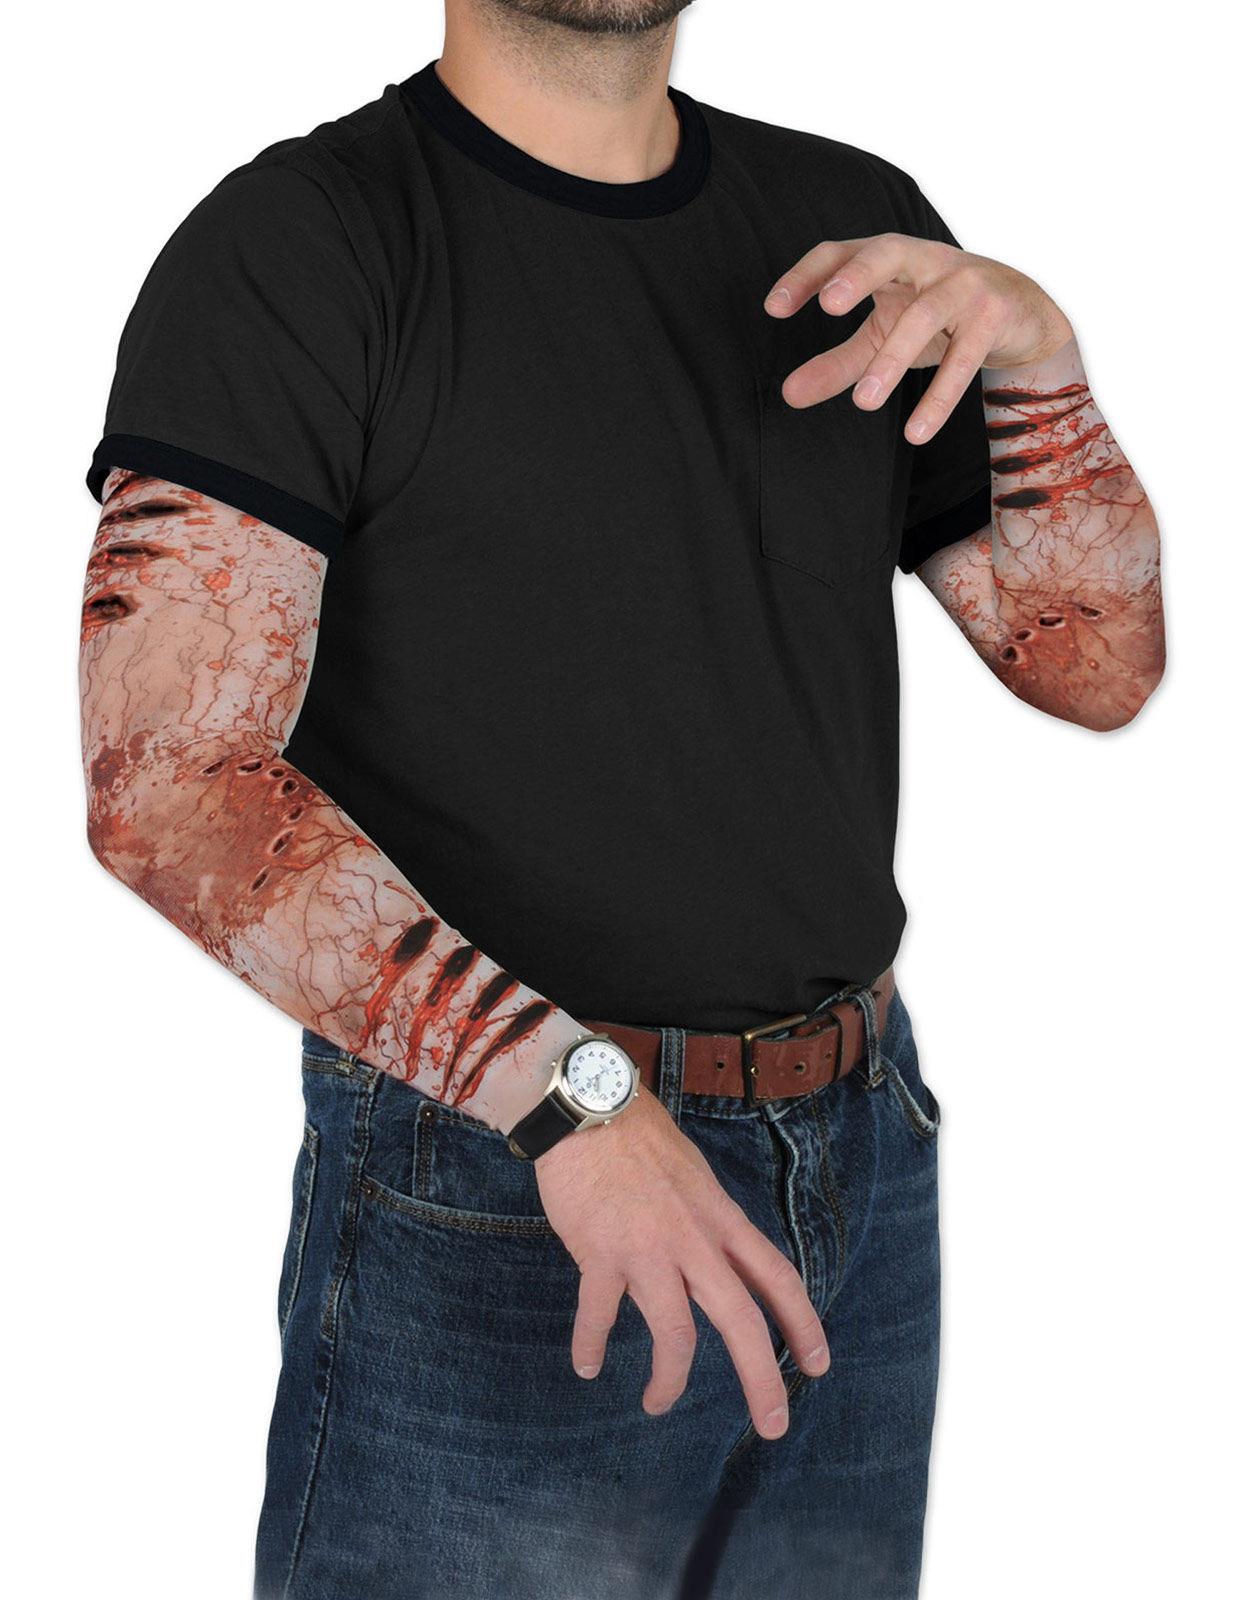 tattoo rmel zombie biss halloween bunt g nstige. Black Bedroom Furniture Sets. Home Design Ideas